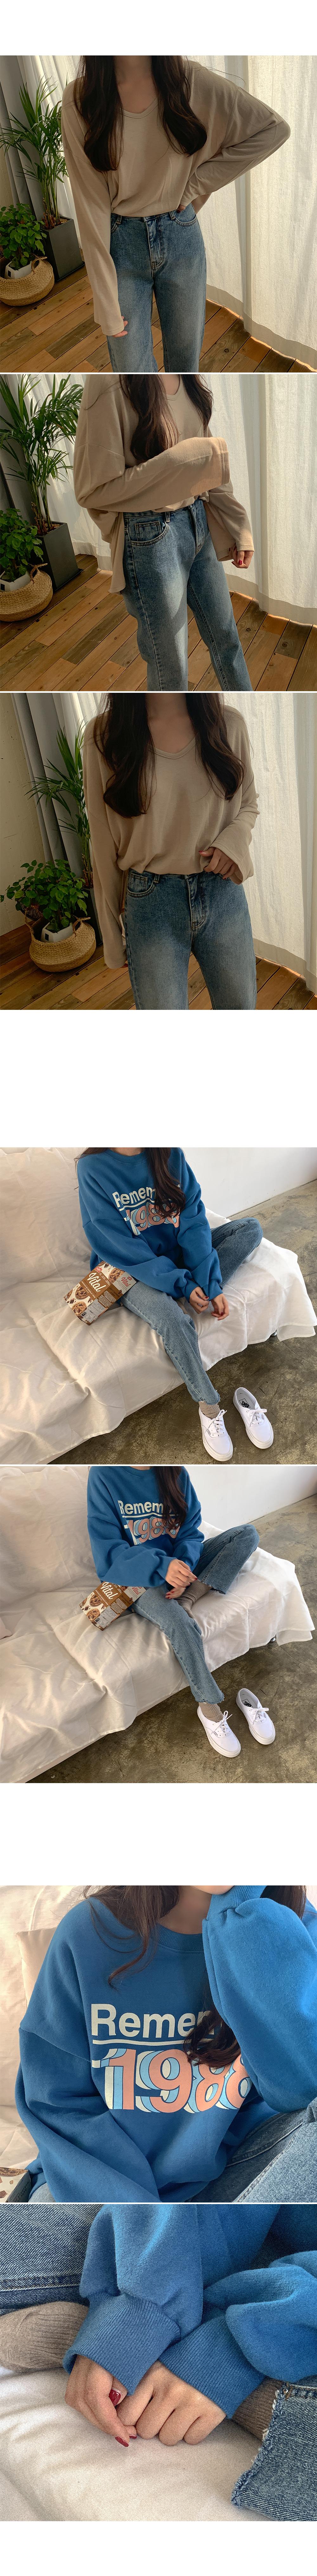 Dusky Woolen Sweatshirt